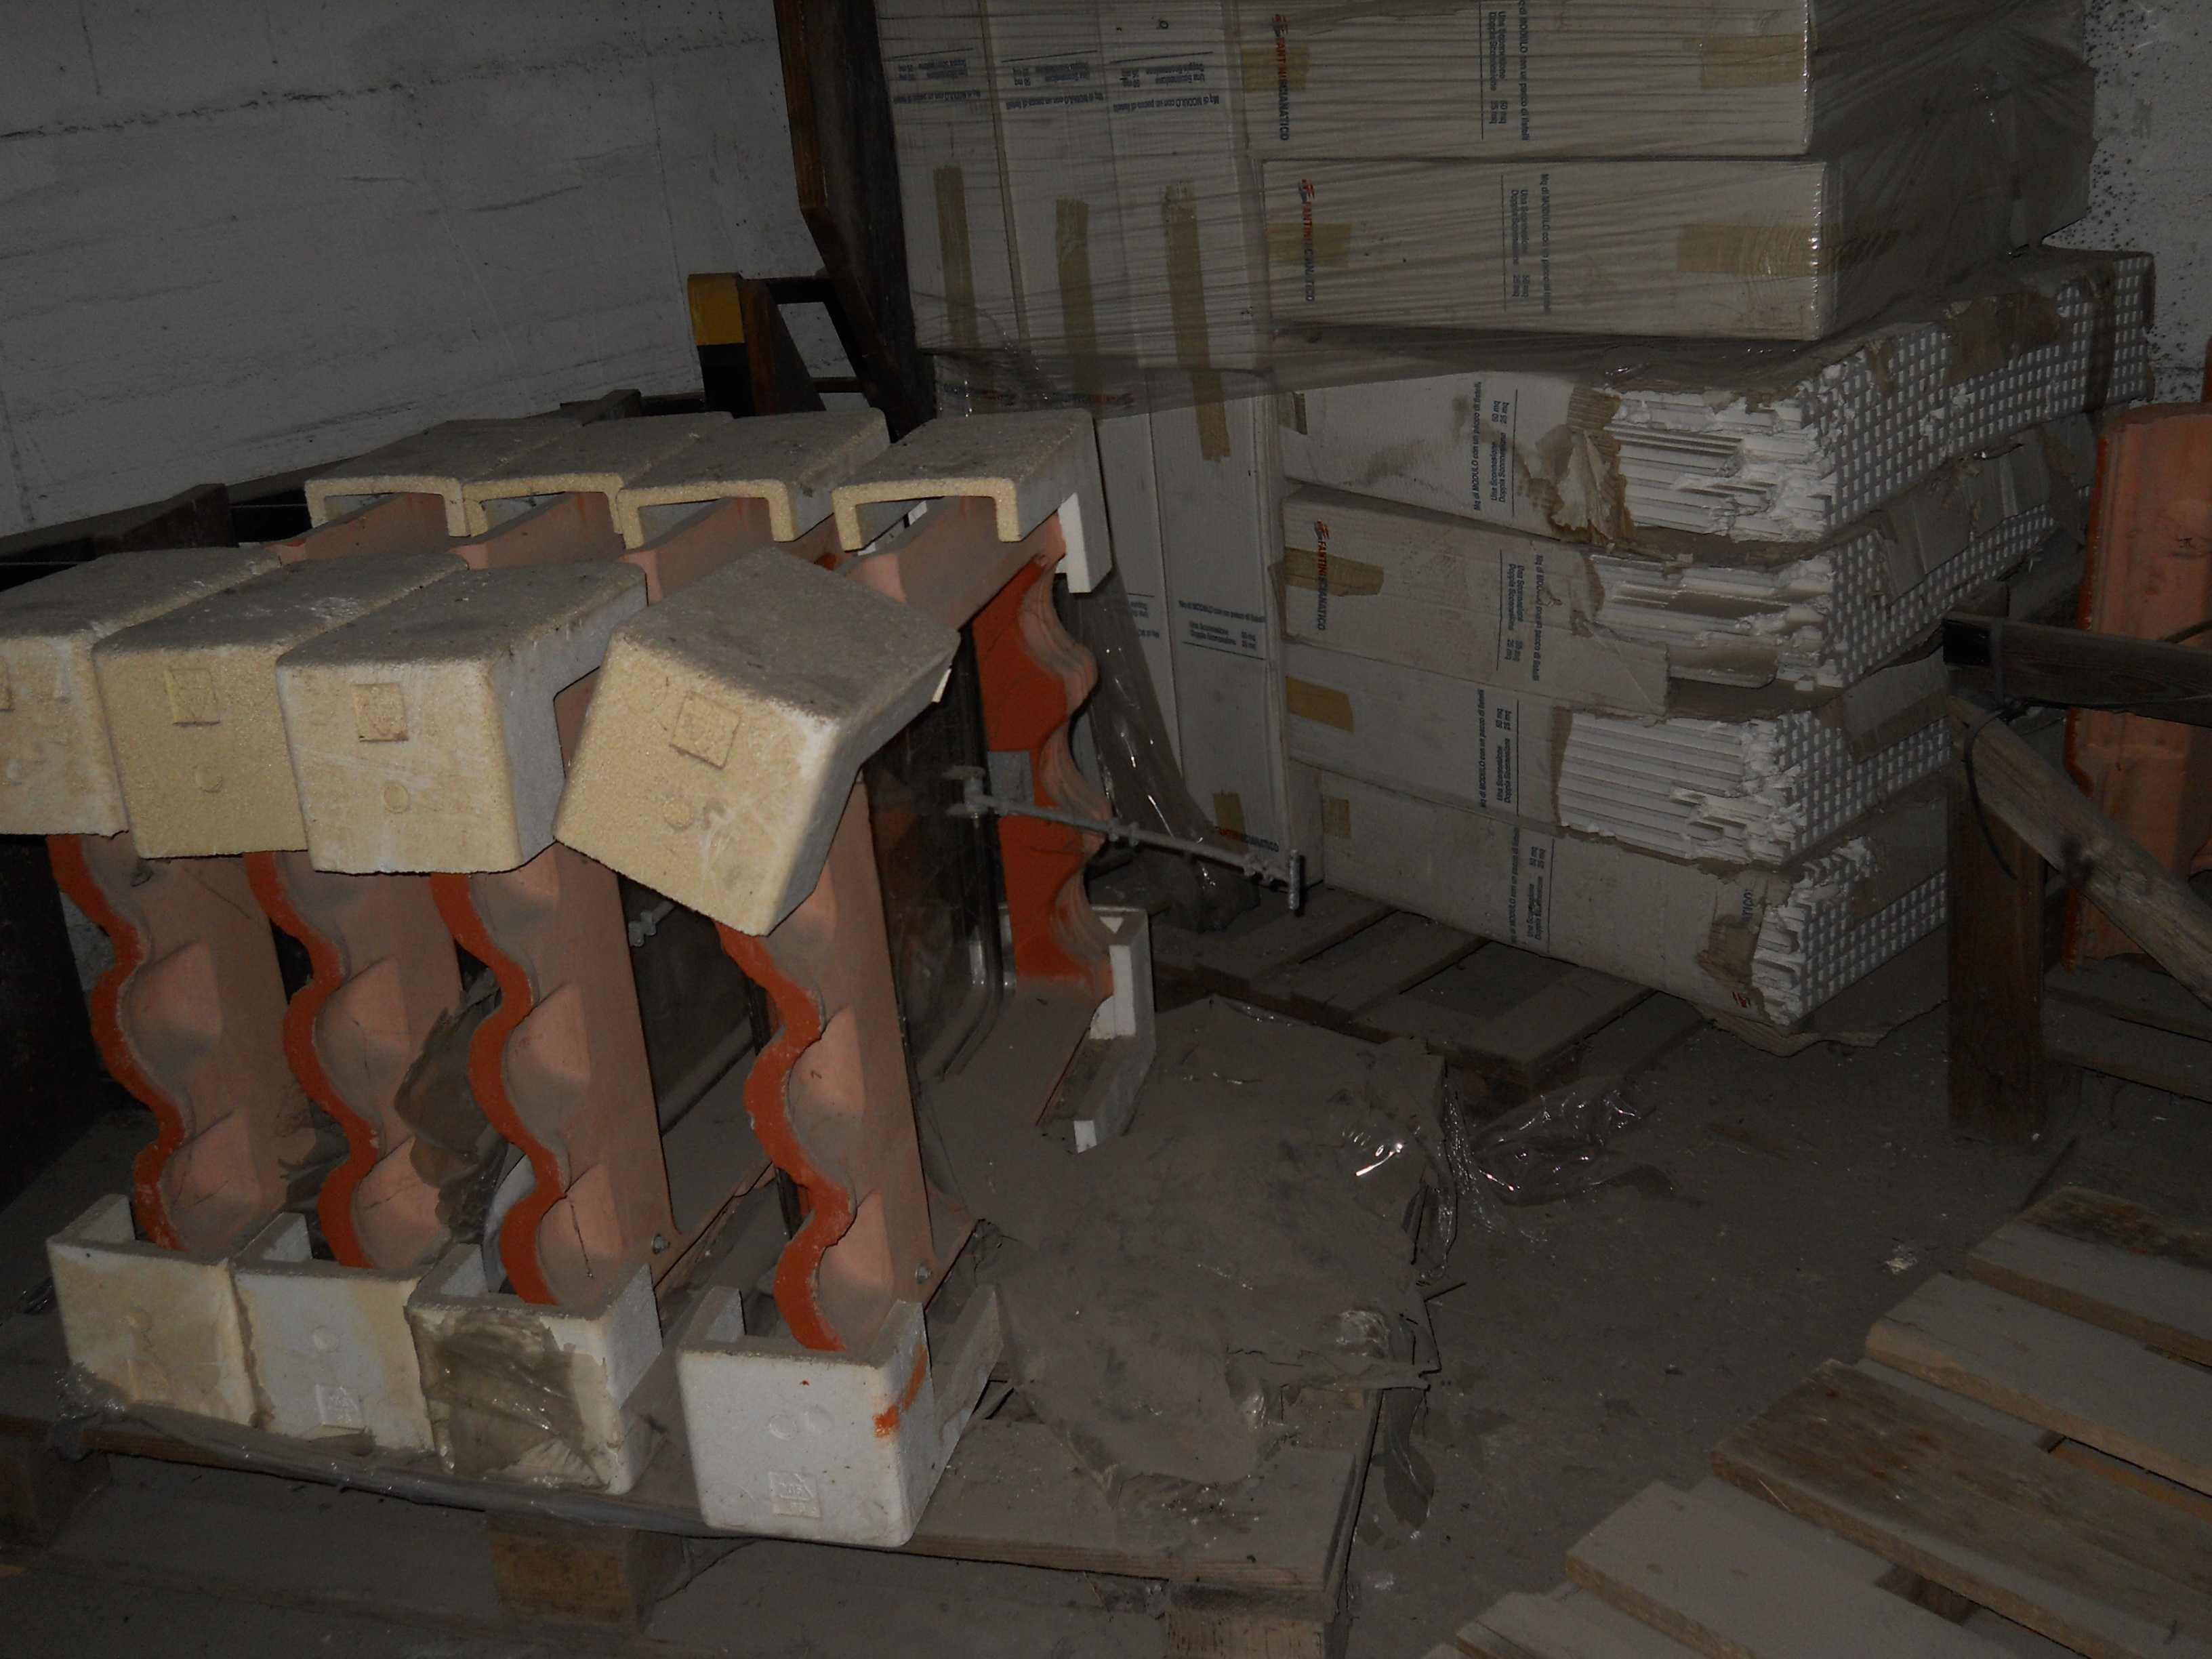 Stock di materiale edile e ferroso vario astemobili